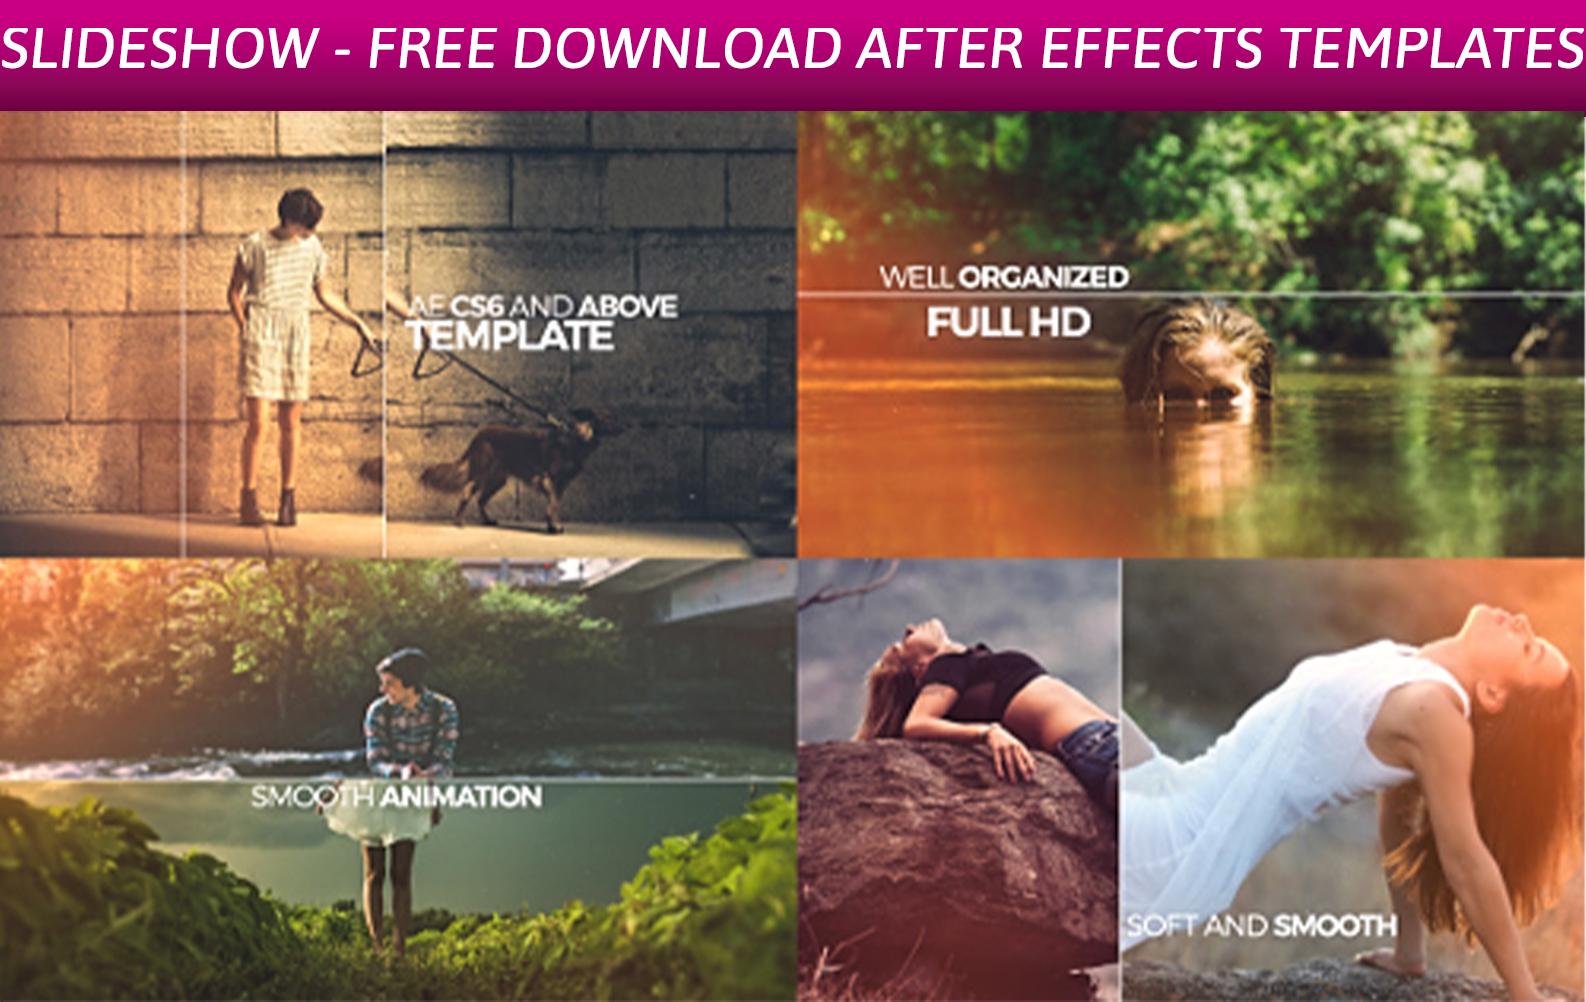 Elegant Opener Slideshow - Free Download After Effects Templates